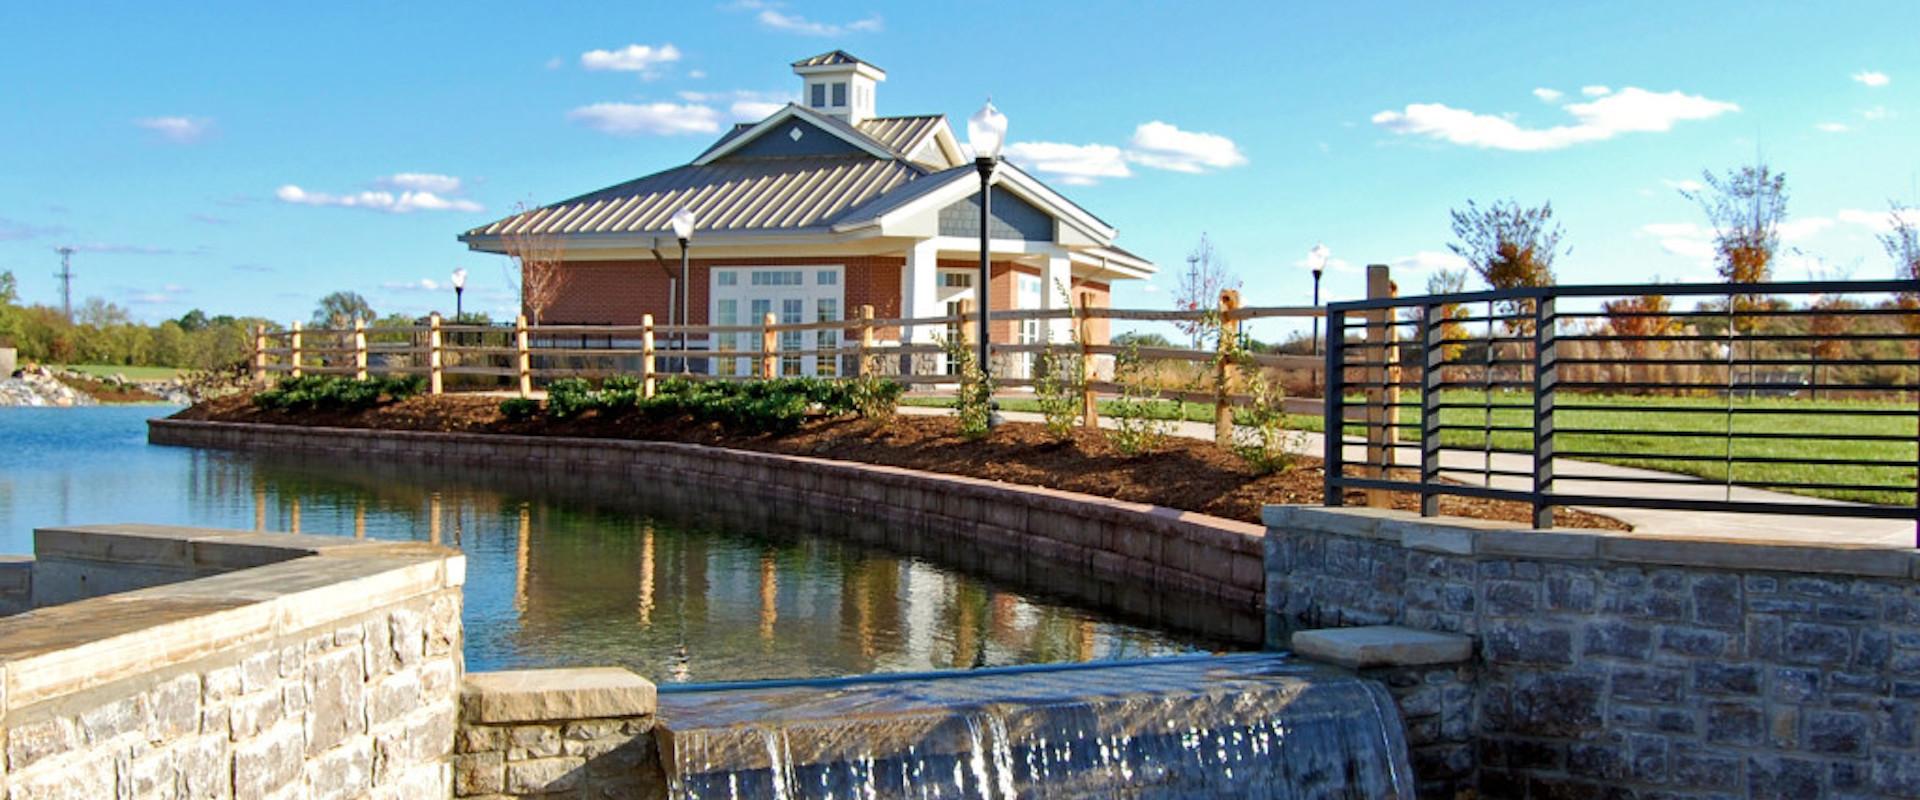 Gateway Island Park 1